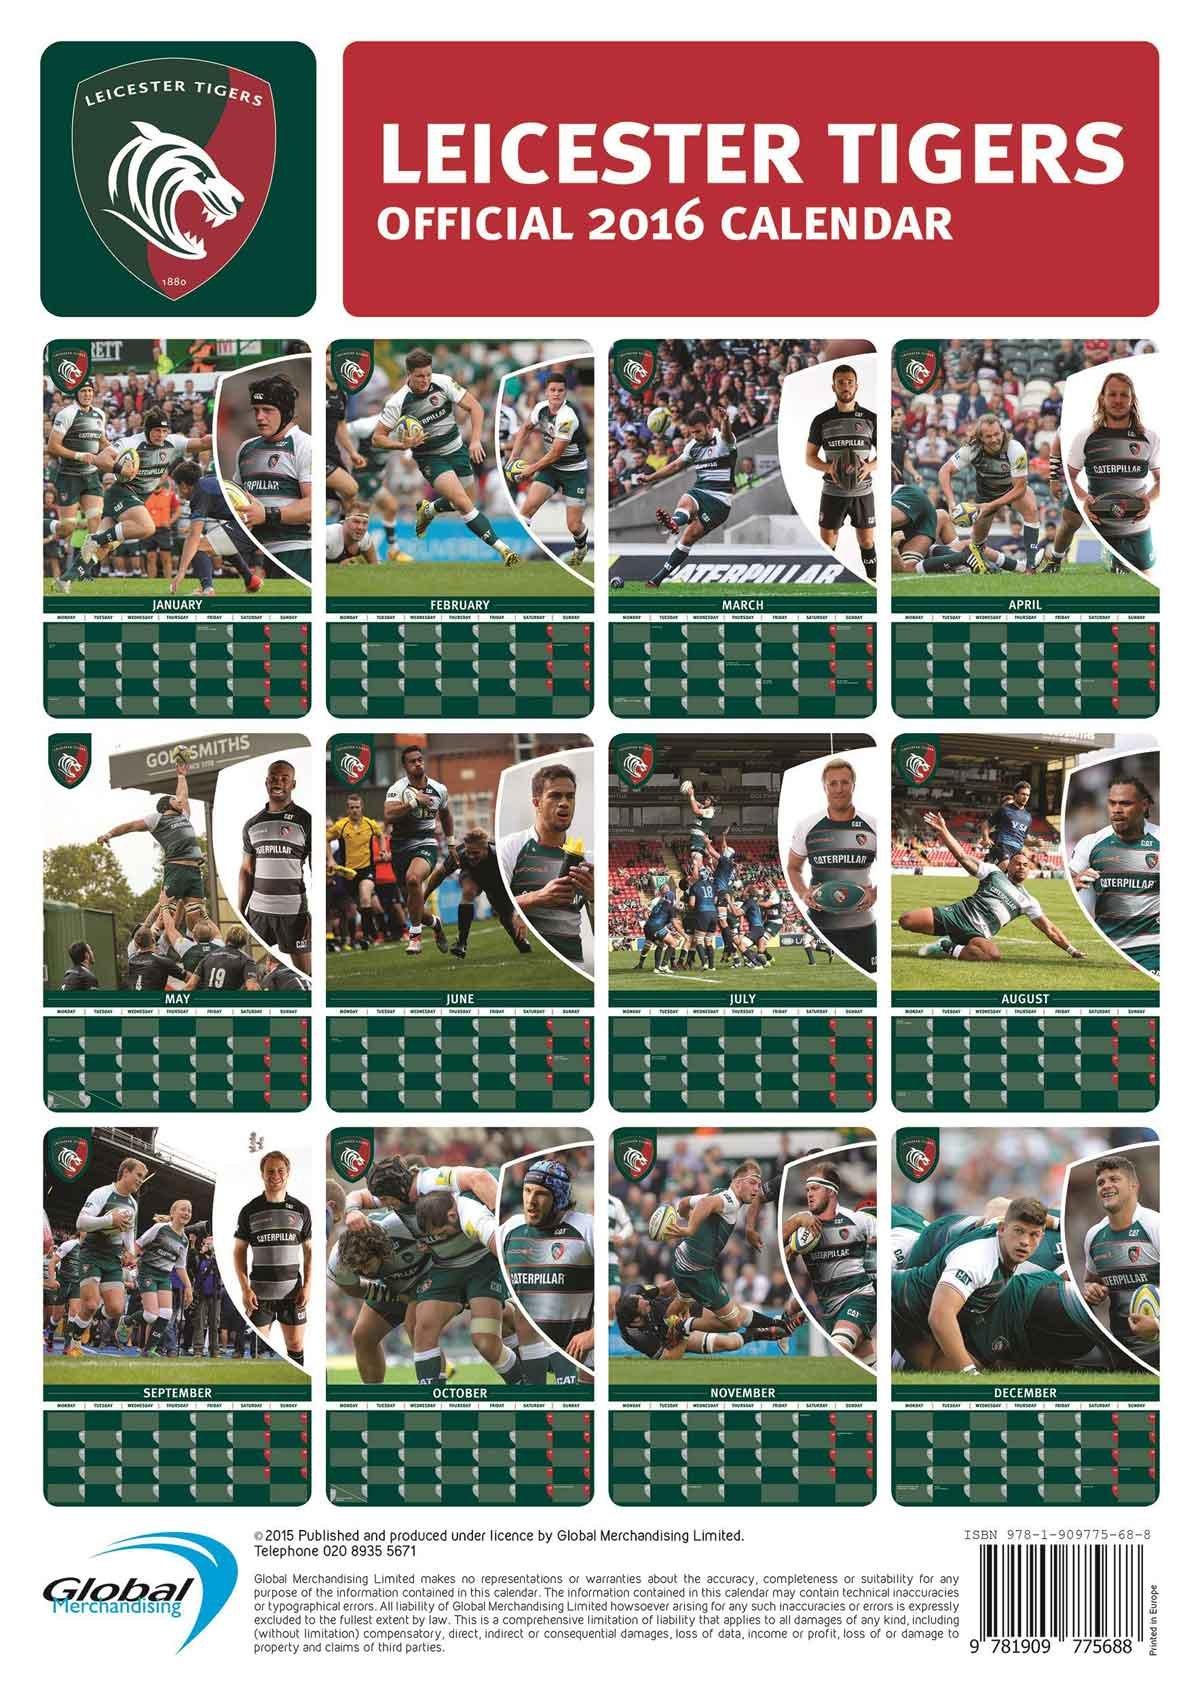 Official 2016 Leicester Tigers Calendar